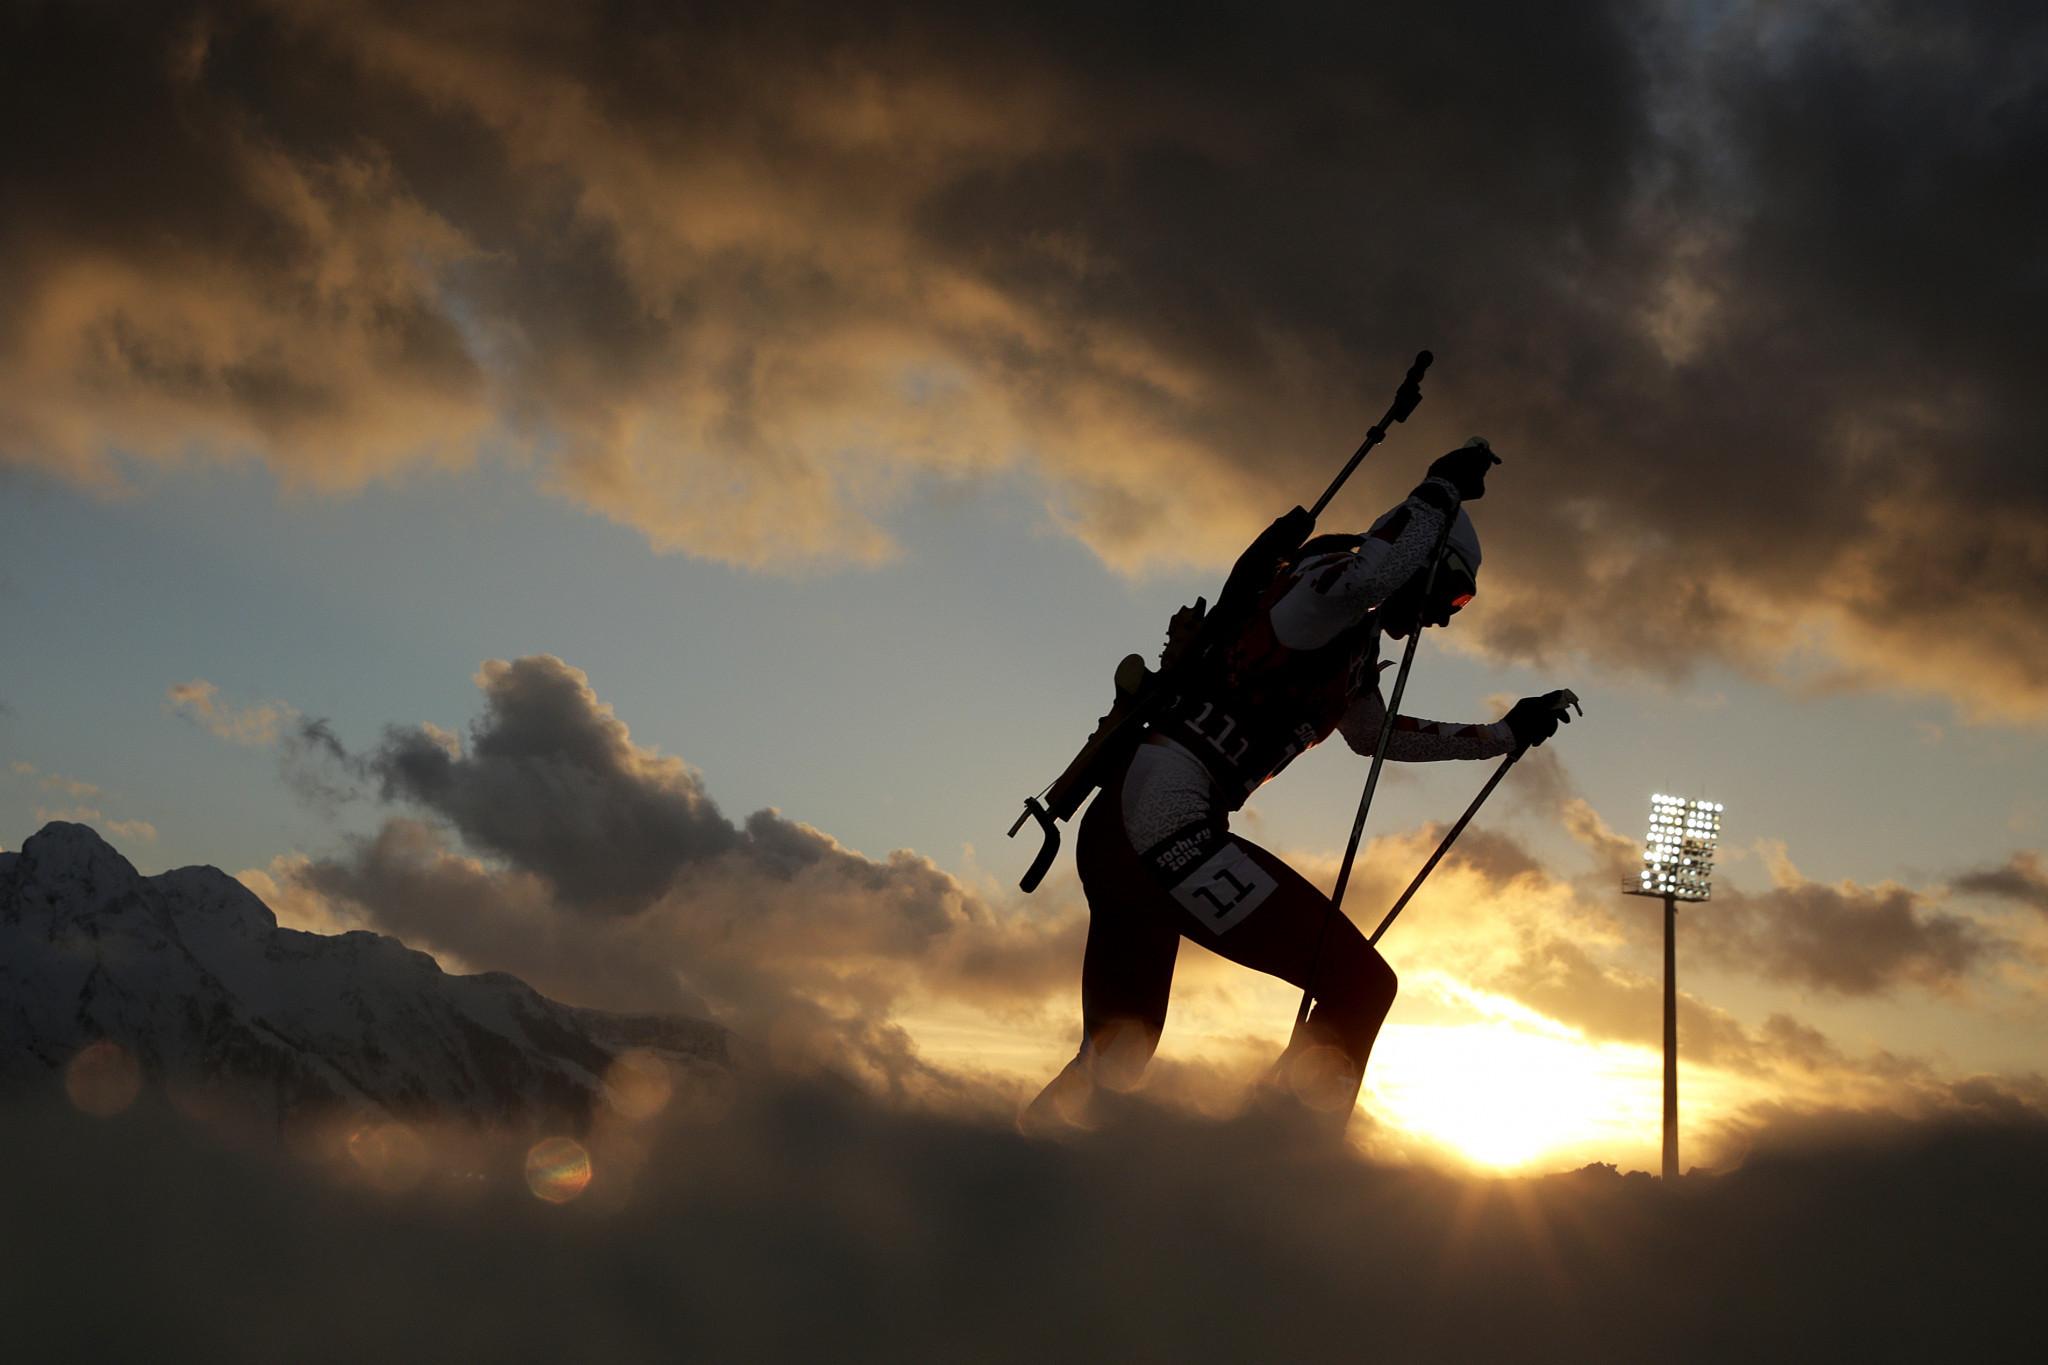 Climate change biggest issue facing biathlon, fans tell IBU survey